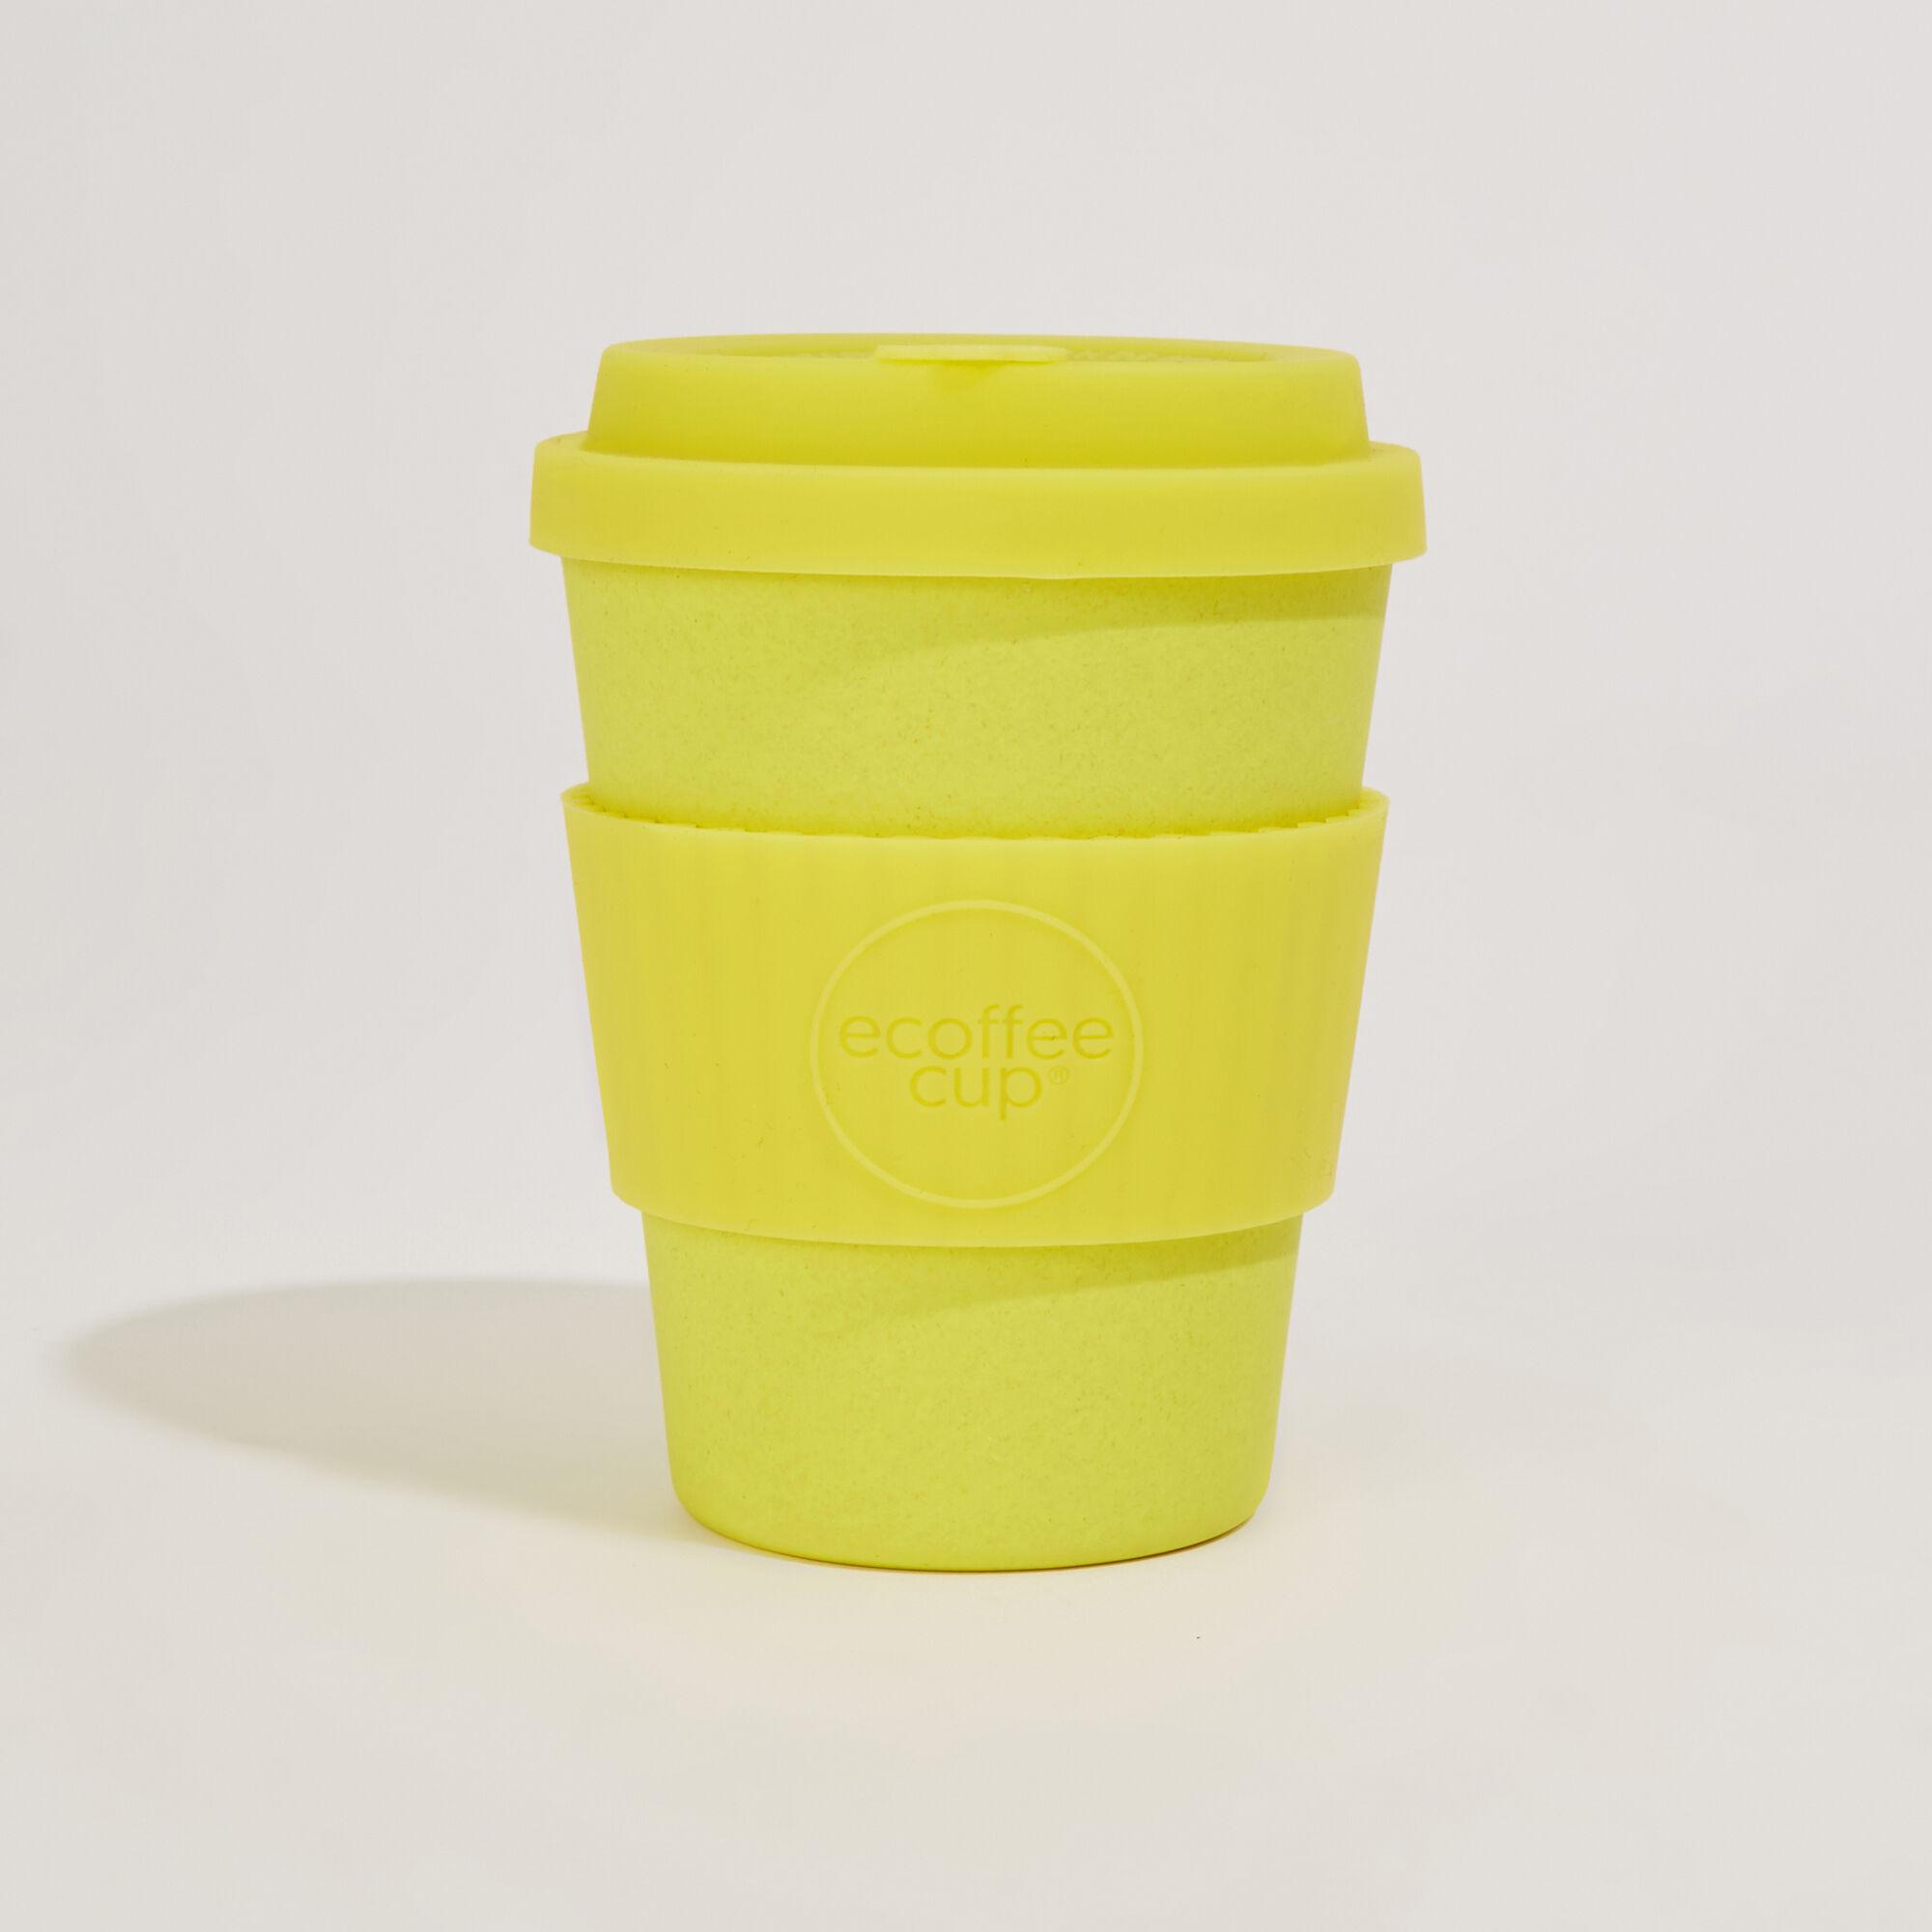 Warehouse, Ecoffee Reusable Coffee Cup Yellow 1